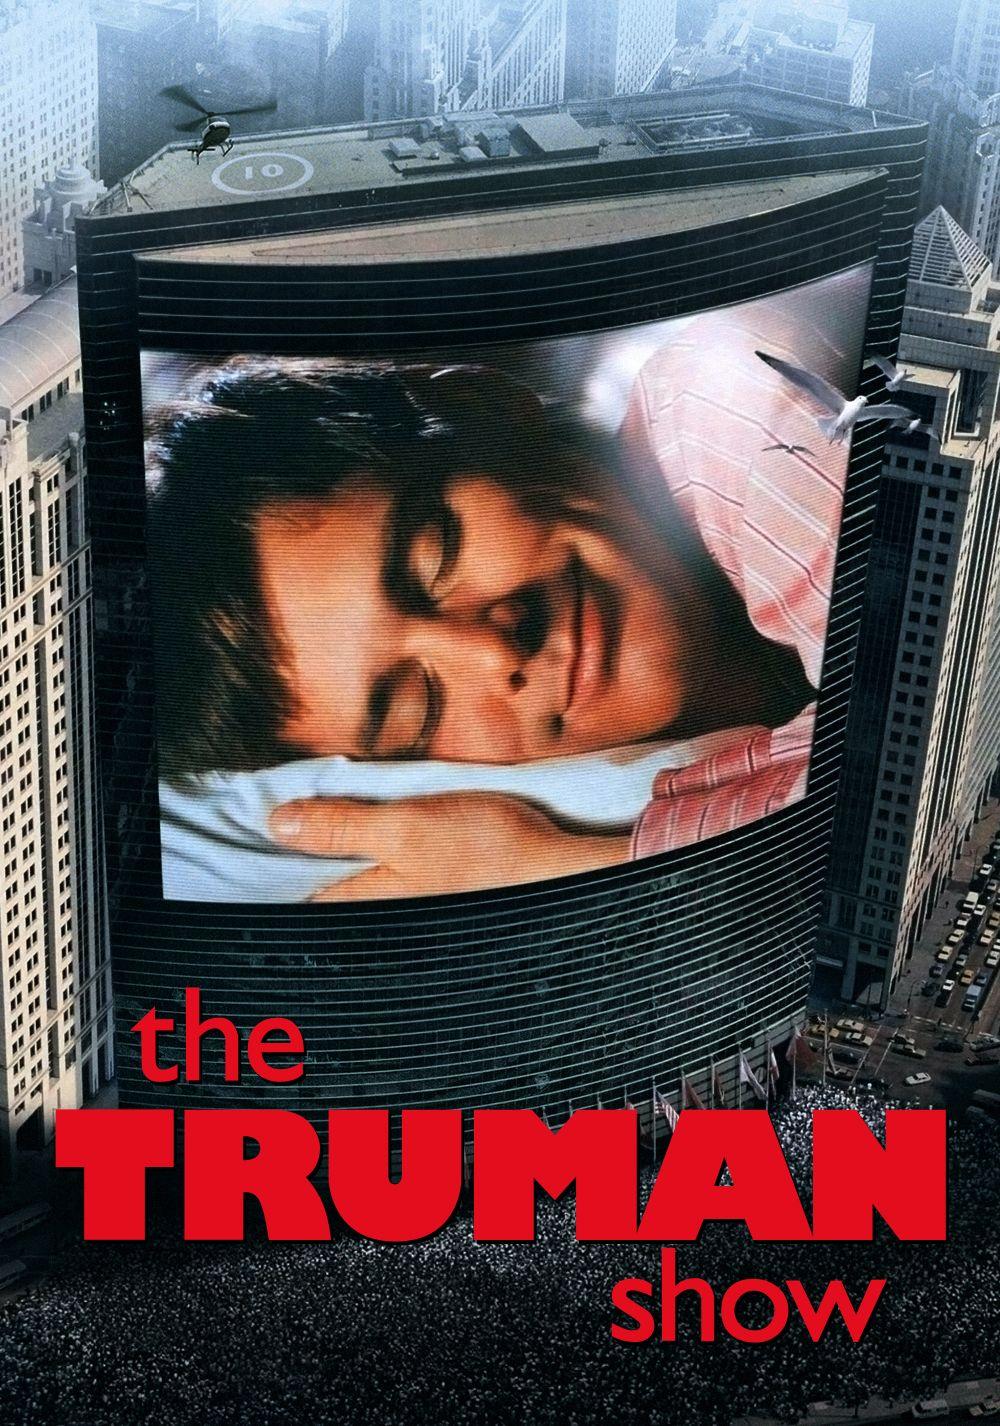 The TRUMAN Show   Film Posters   Pinterest